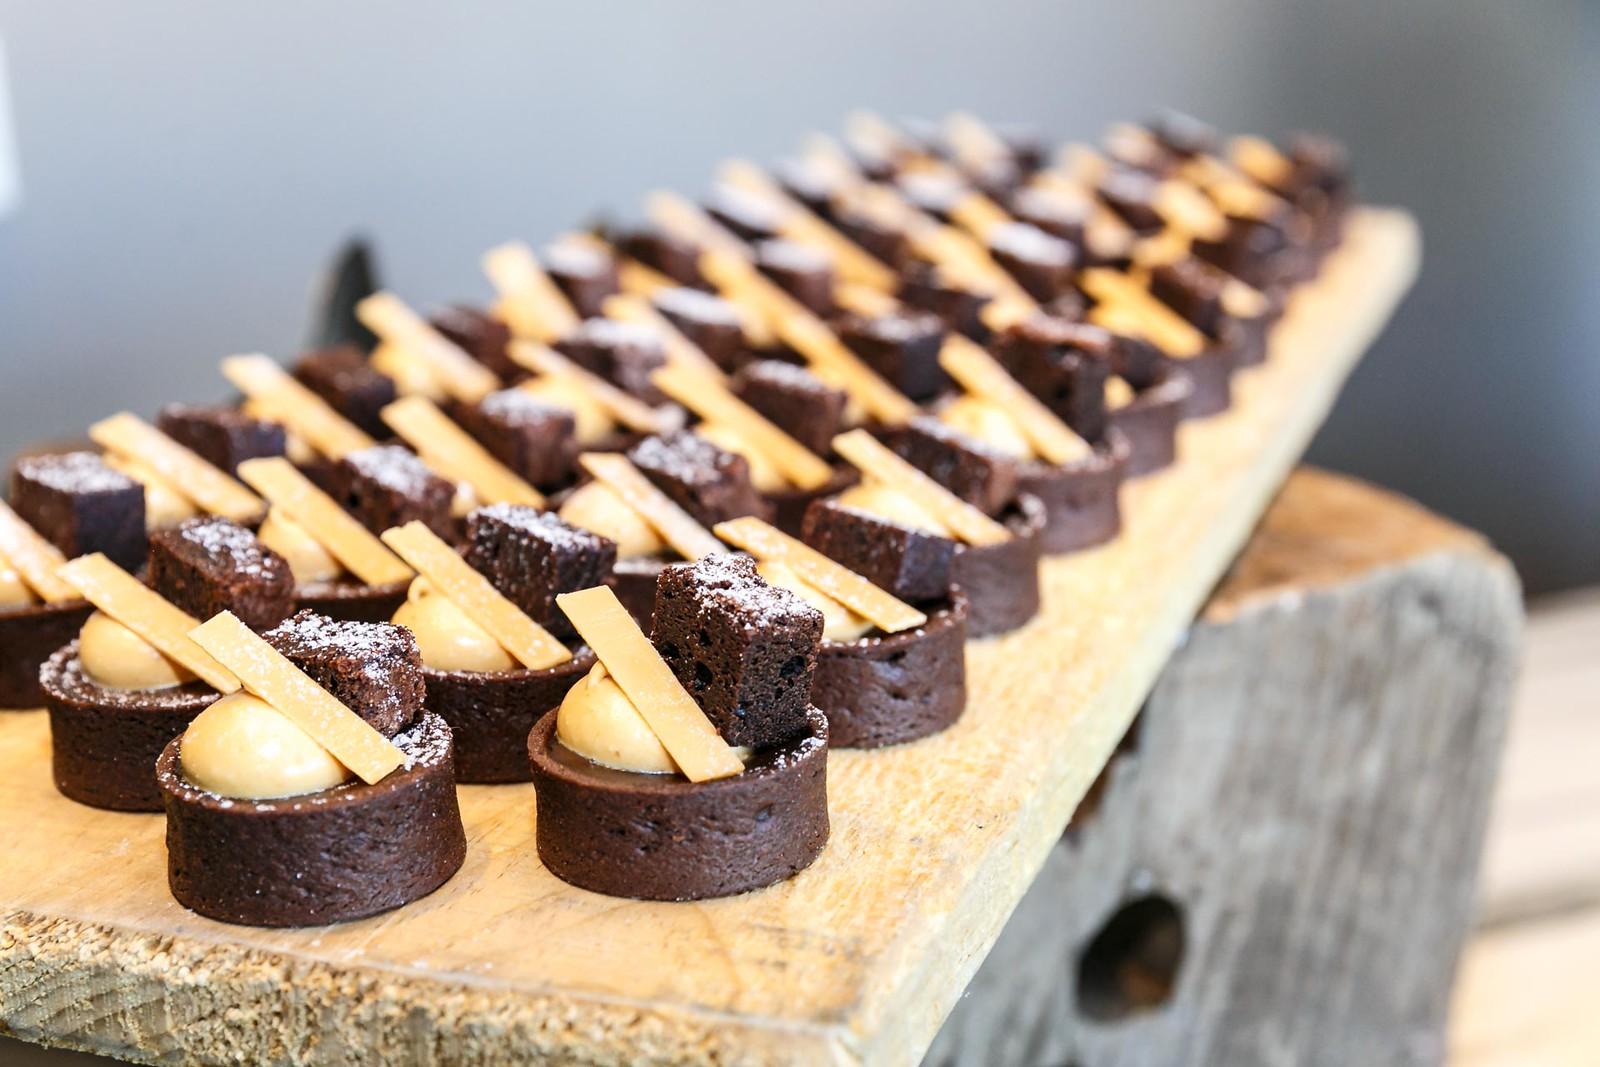 Dessert tray kellyelko.com